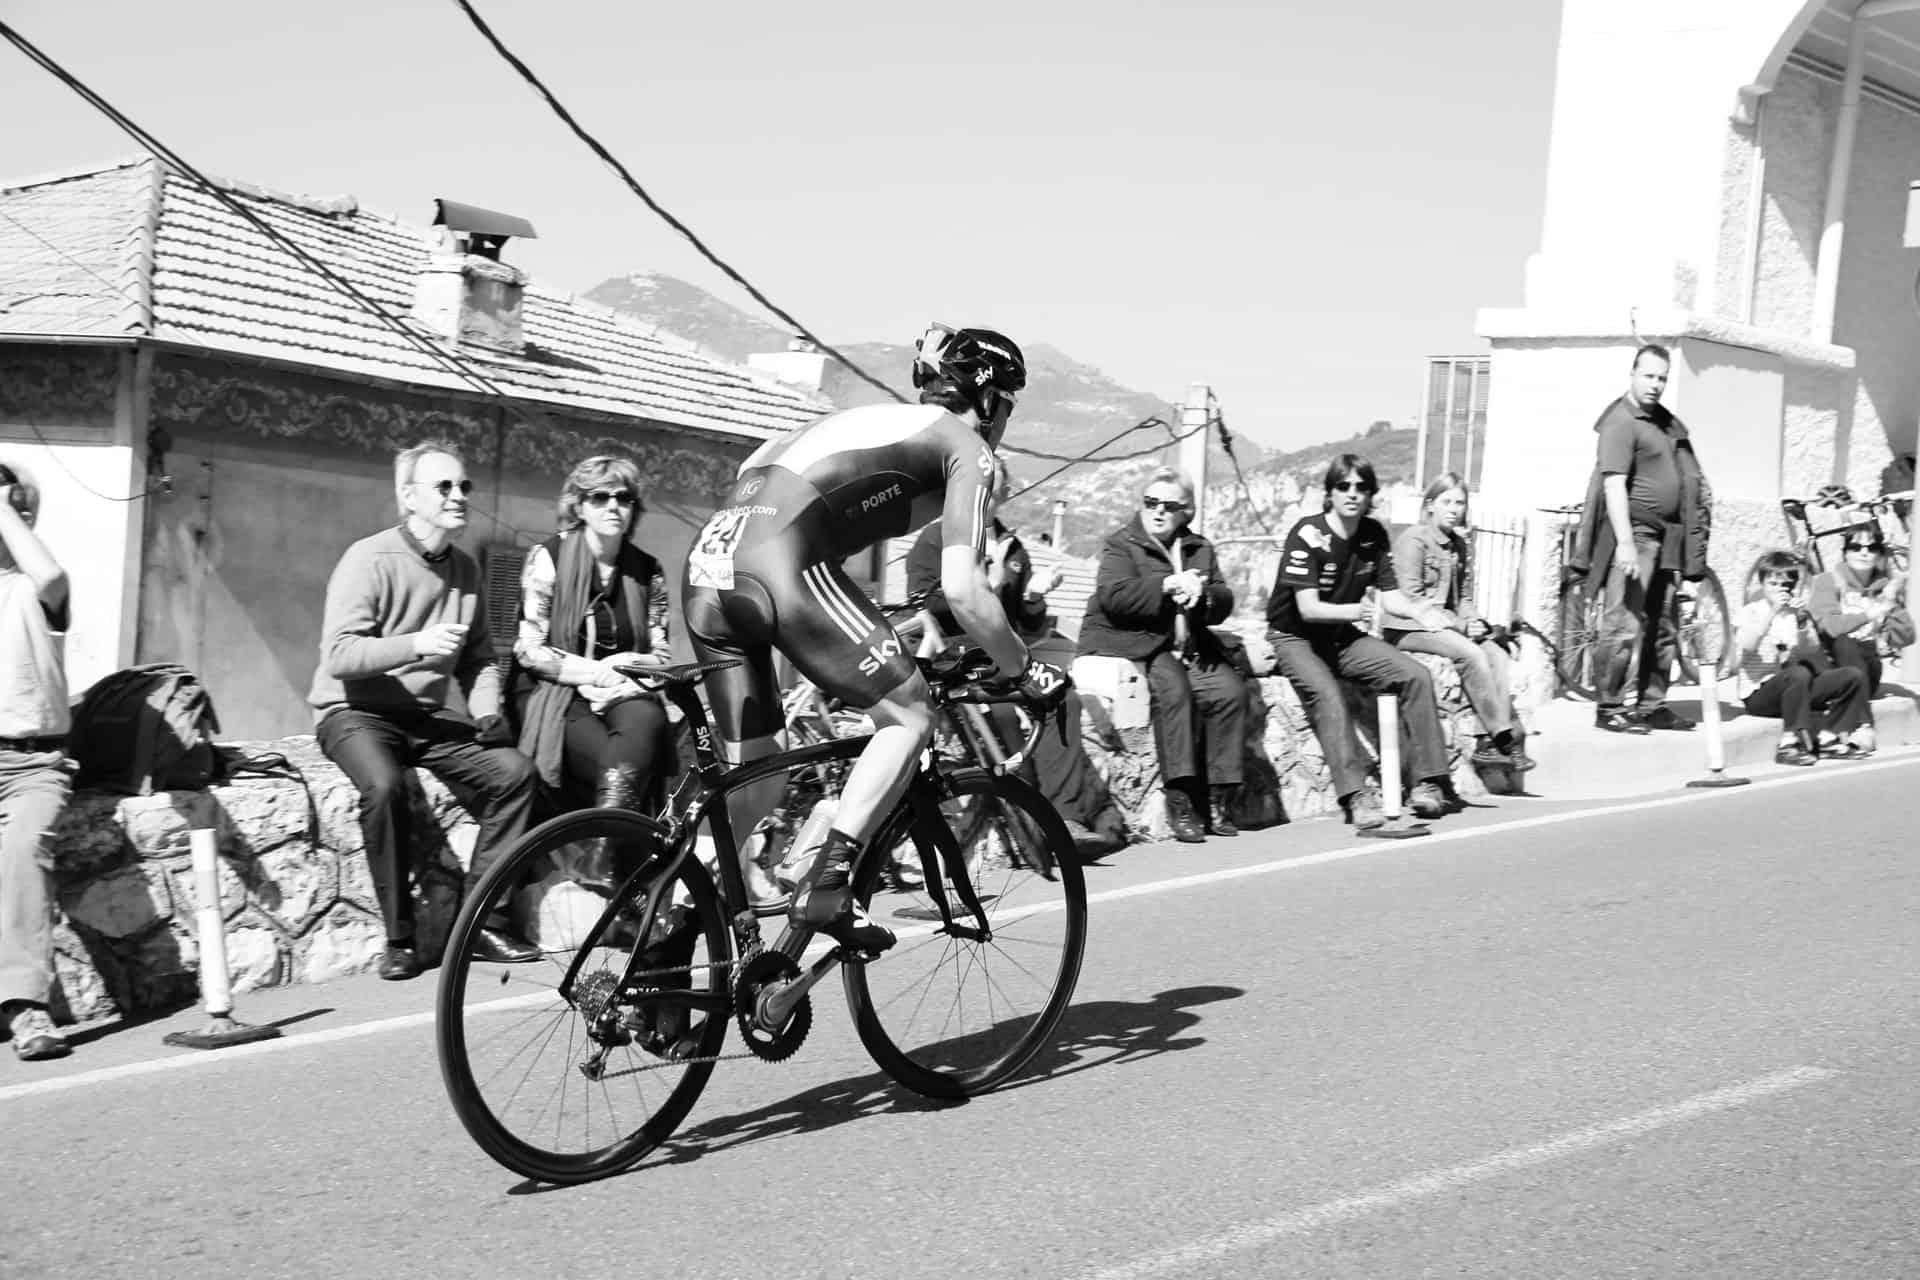 Blog Tom de ongelukkige wielrennner - Photo by Simon Connellan